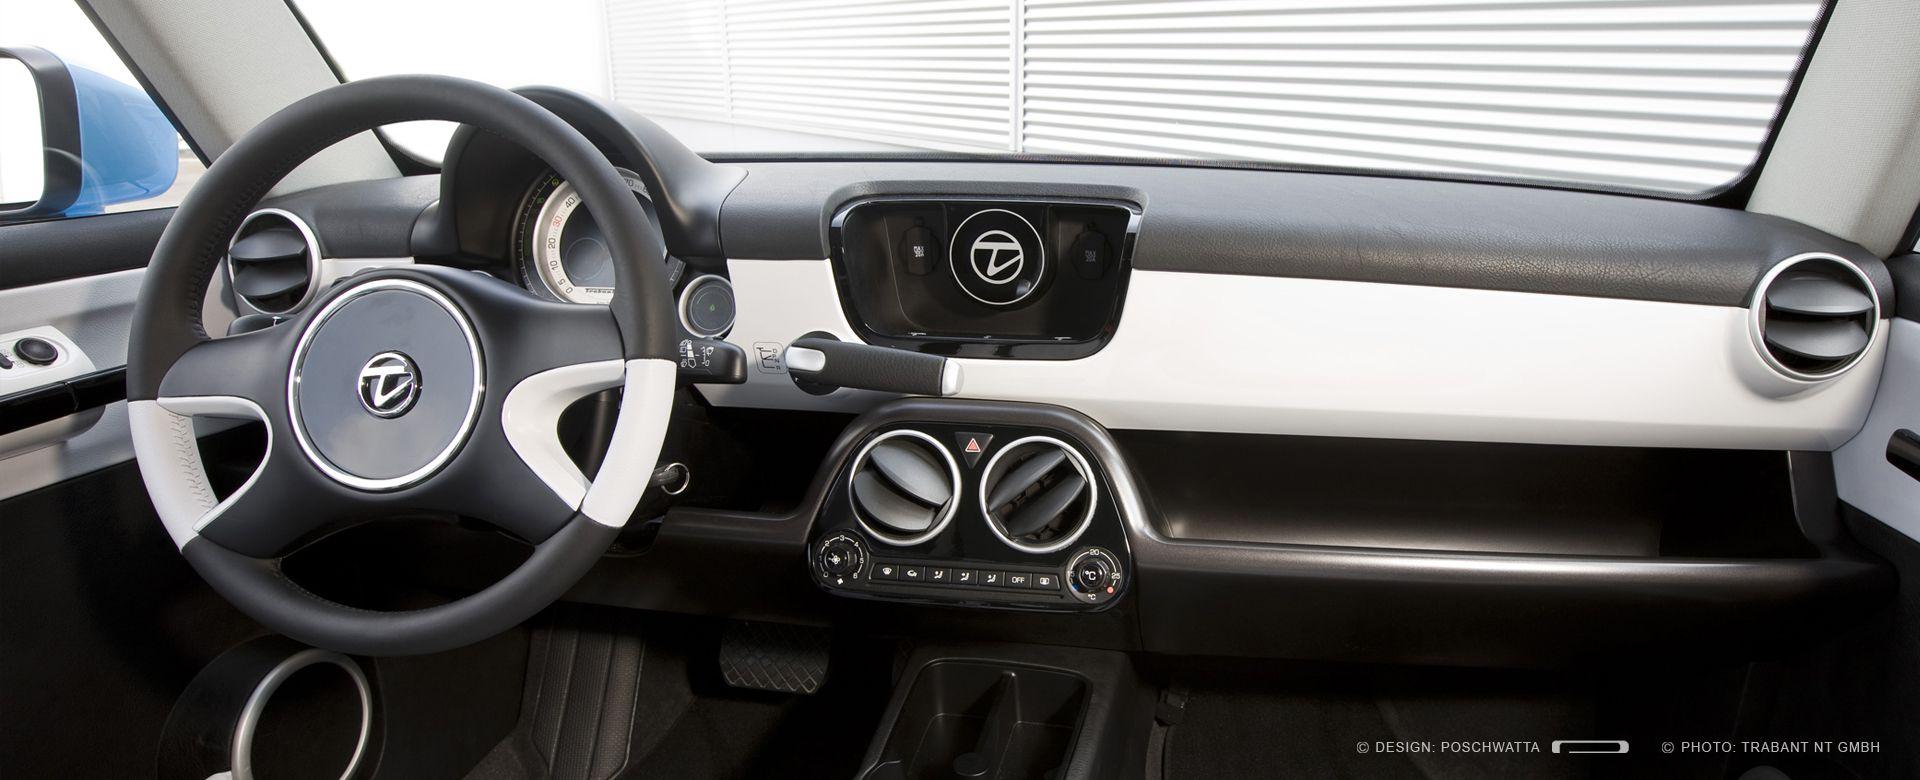 Trabant nT - Poschwatta automotive